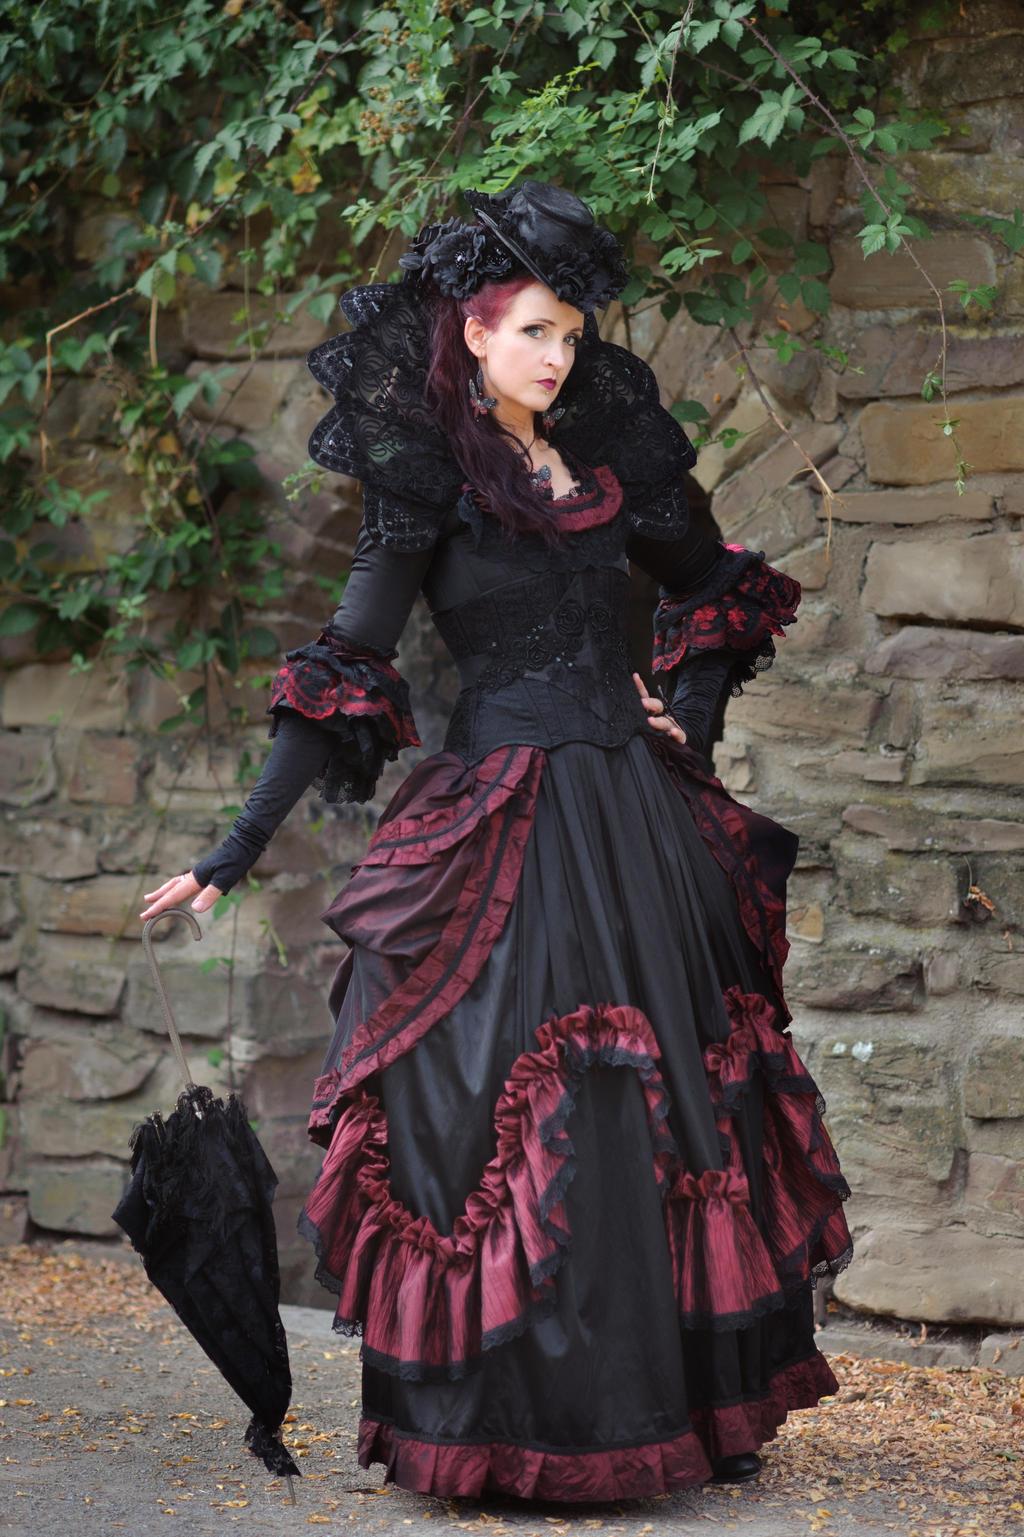 Stock - Baroque Lady with umbrella pose gothic 1